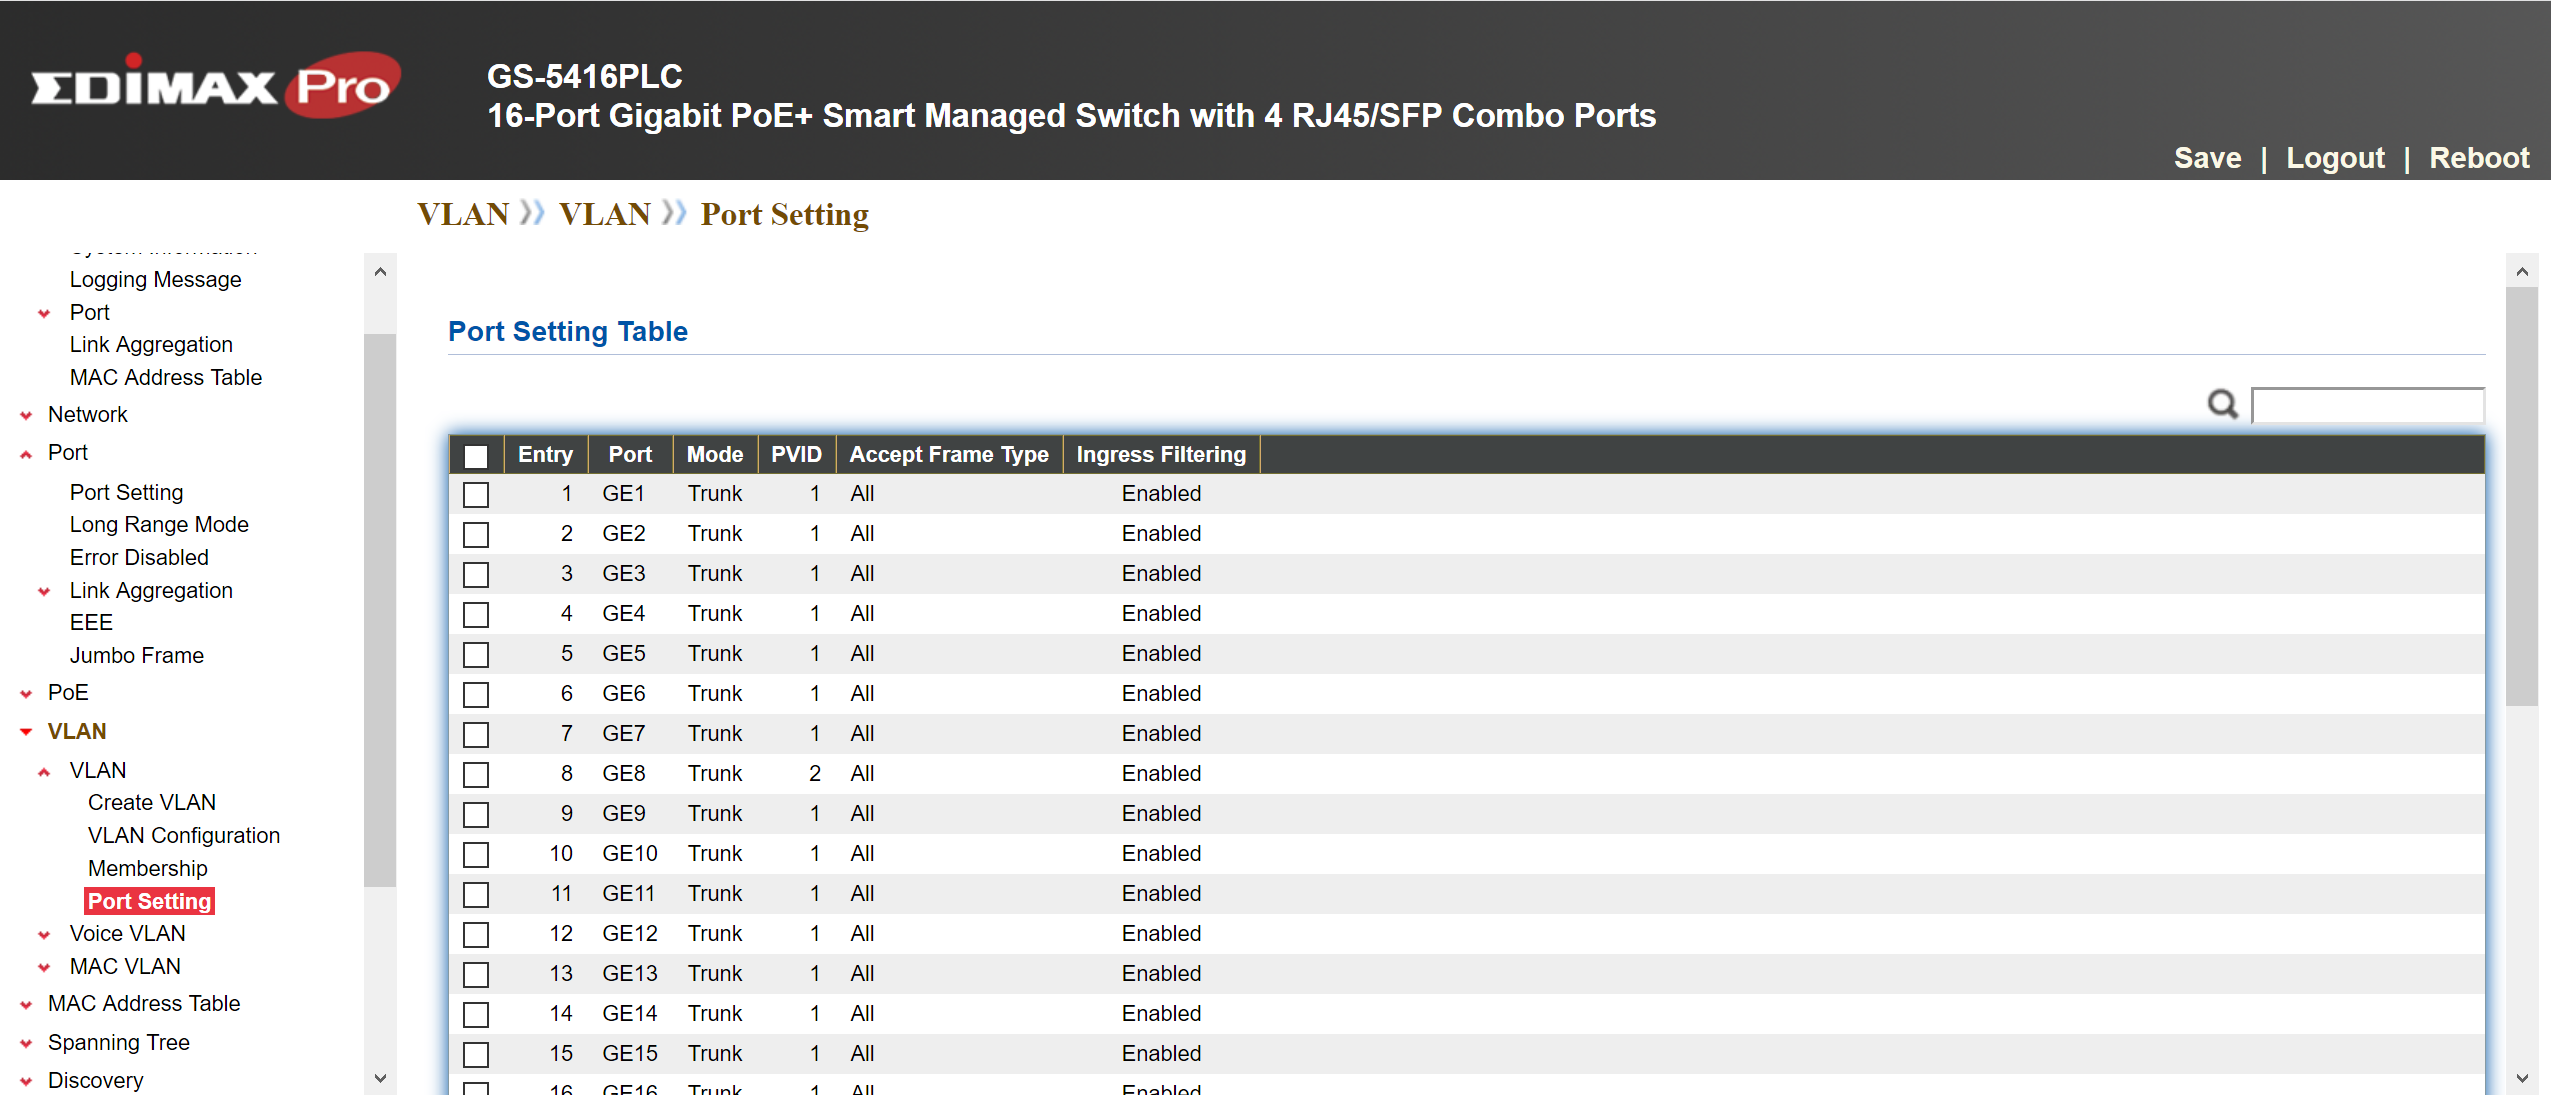 Manual para configurar VLANs en un AP Edimax Pro con switch